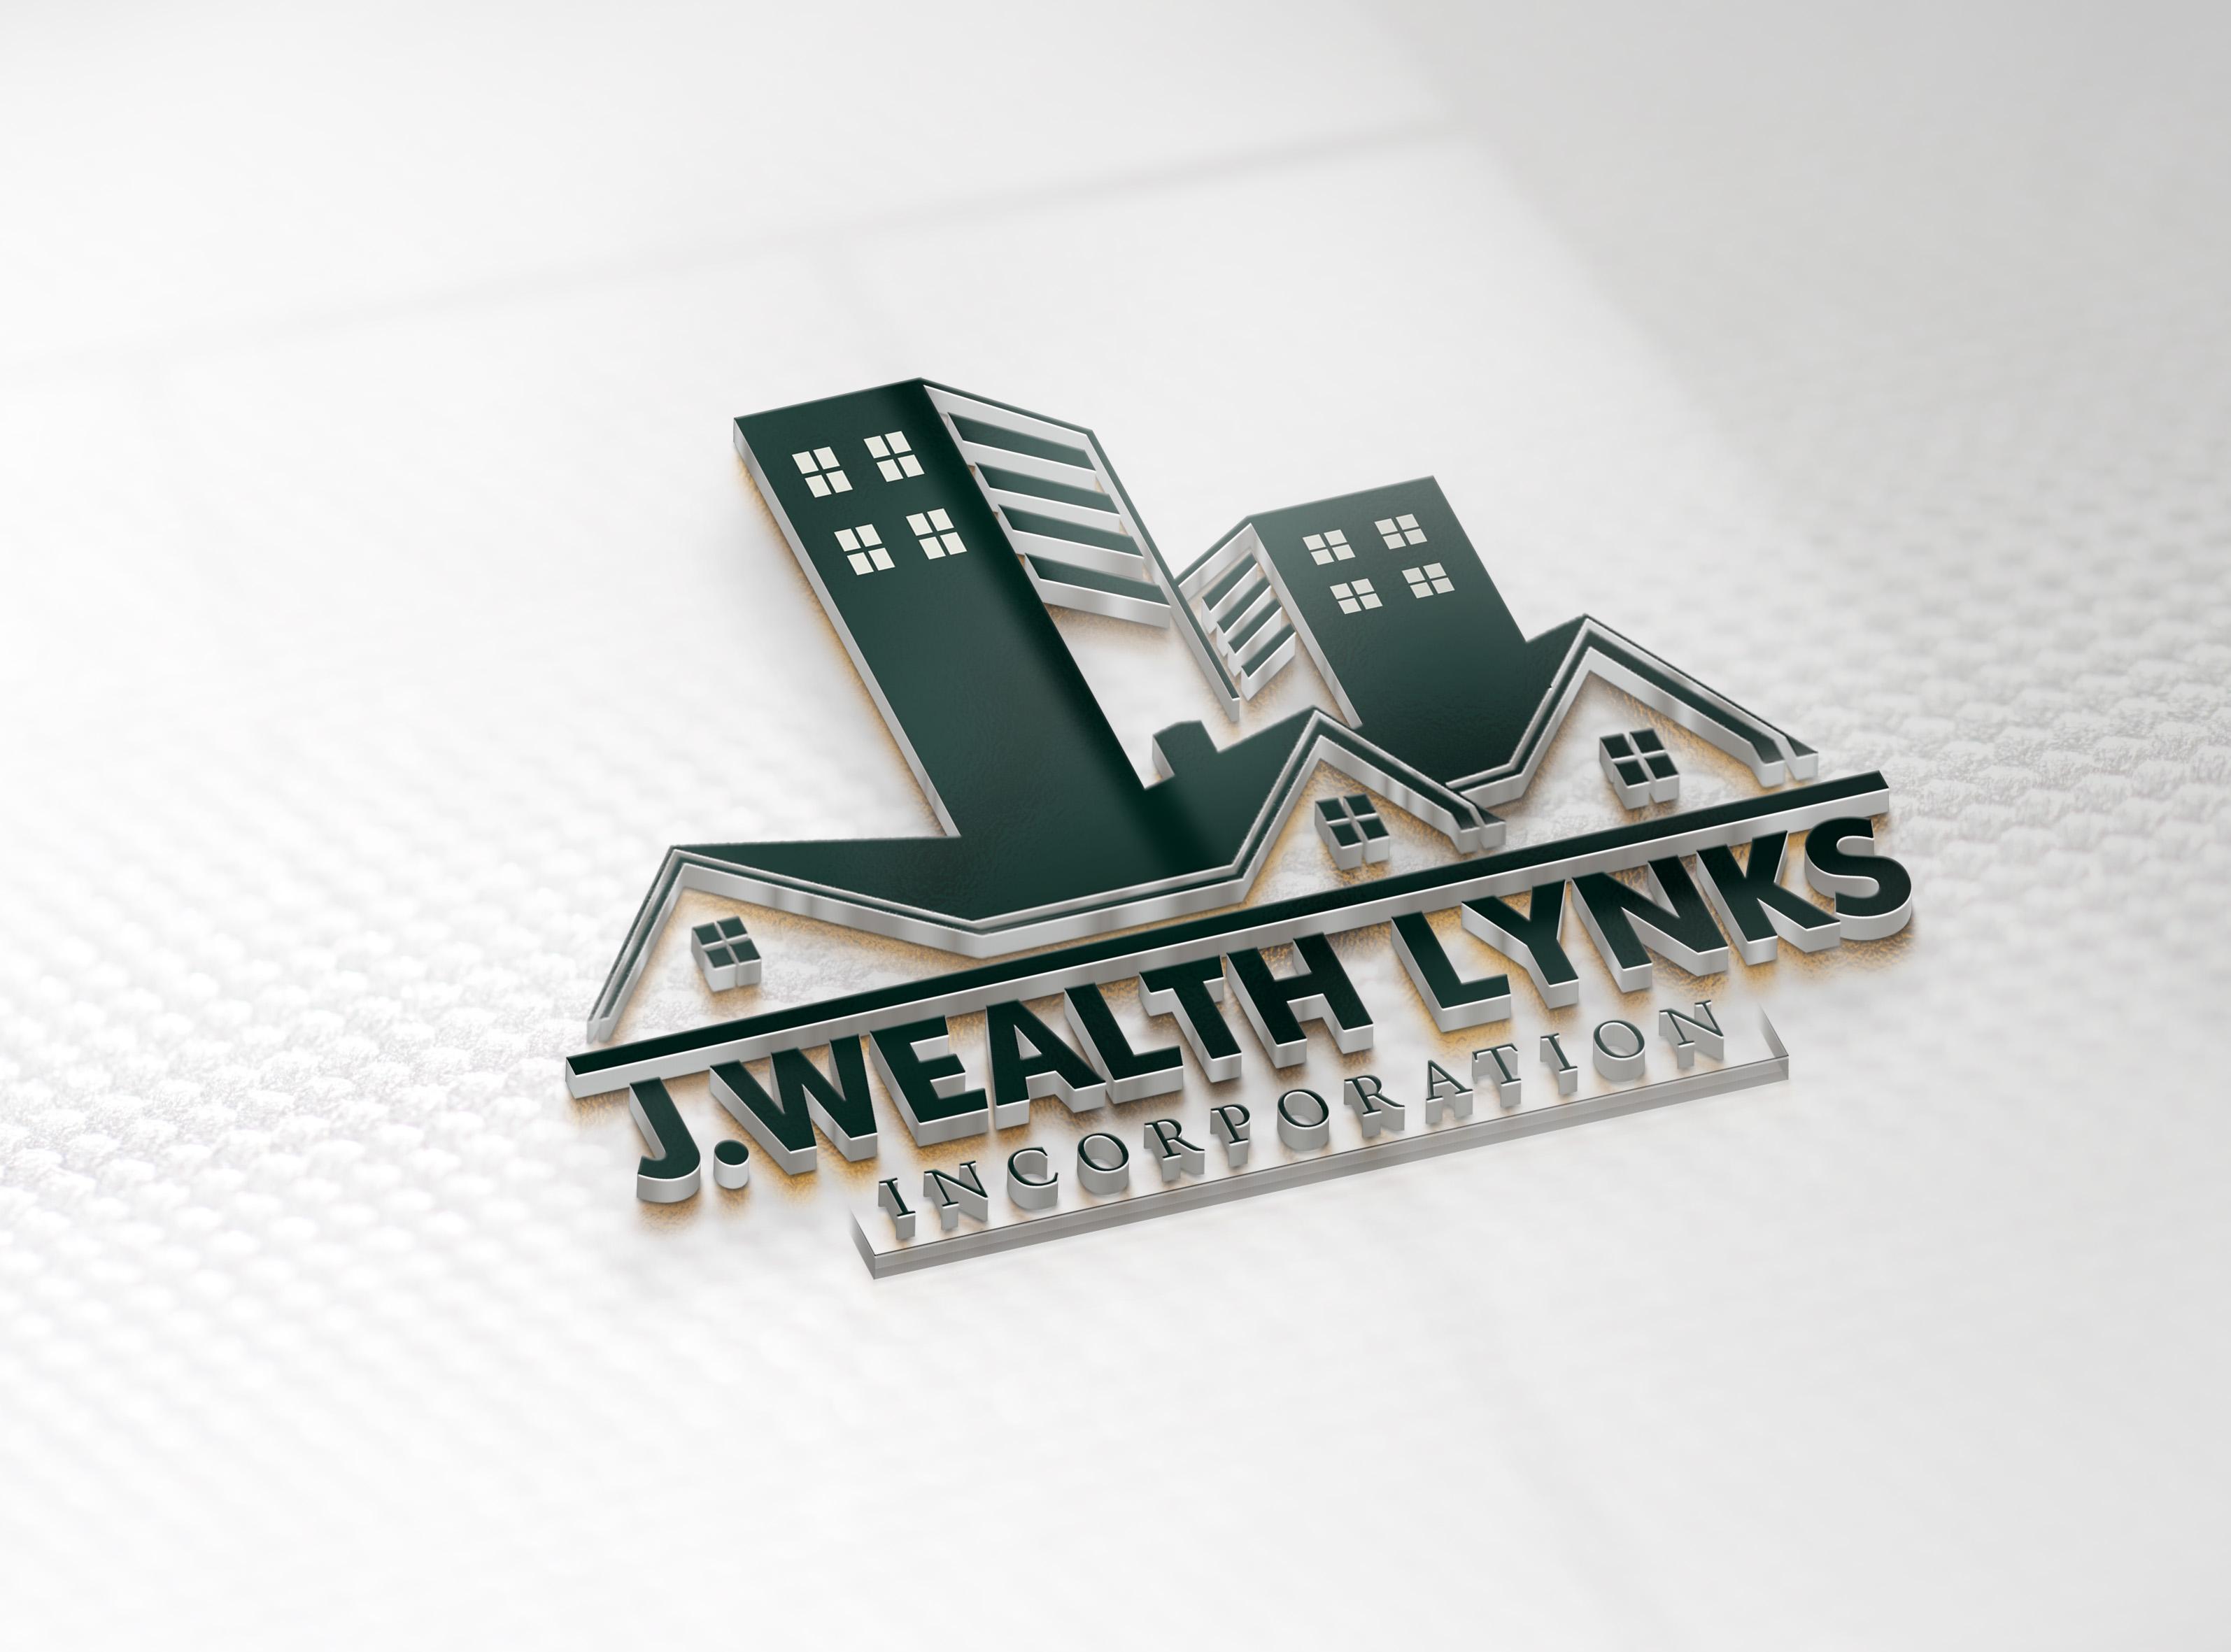 J Wealth Lynks